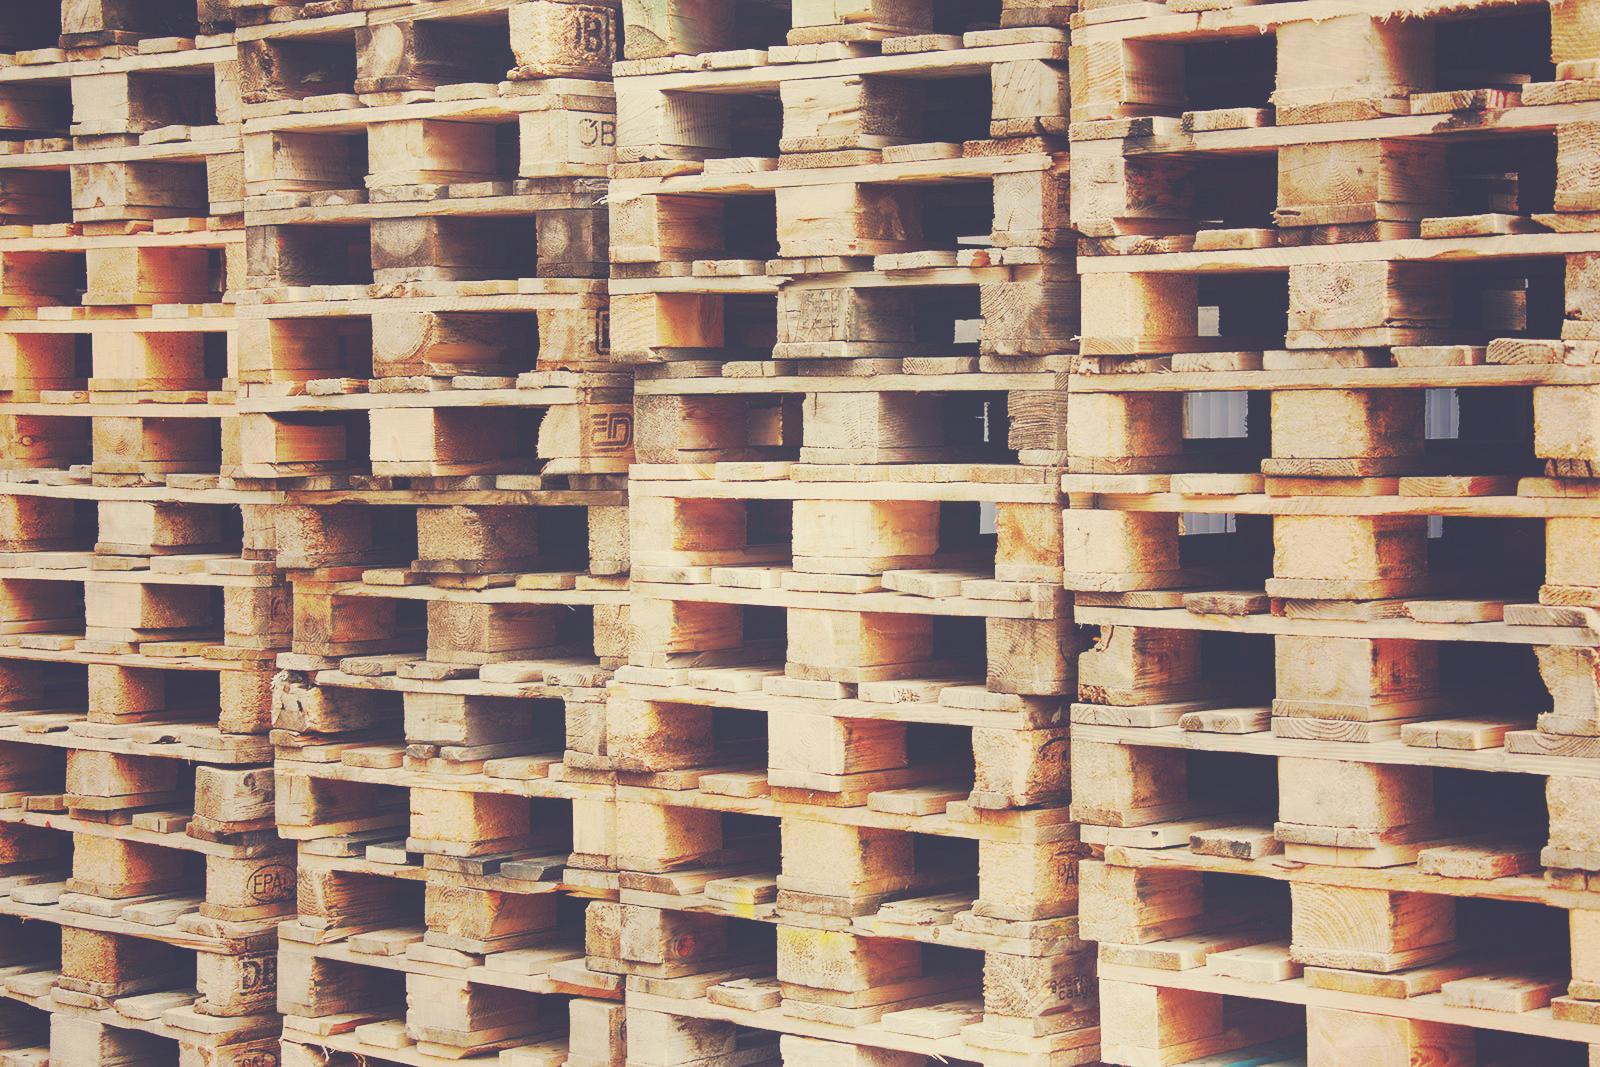 Montipall – Armazenamento de paletes